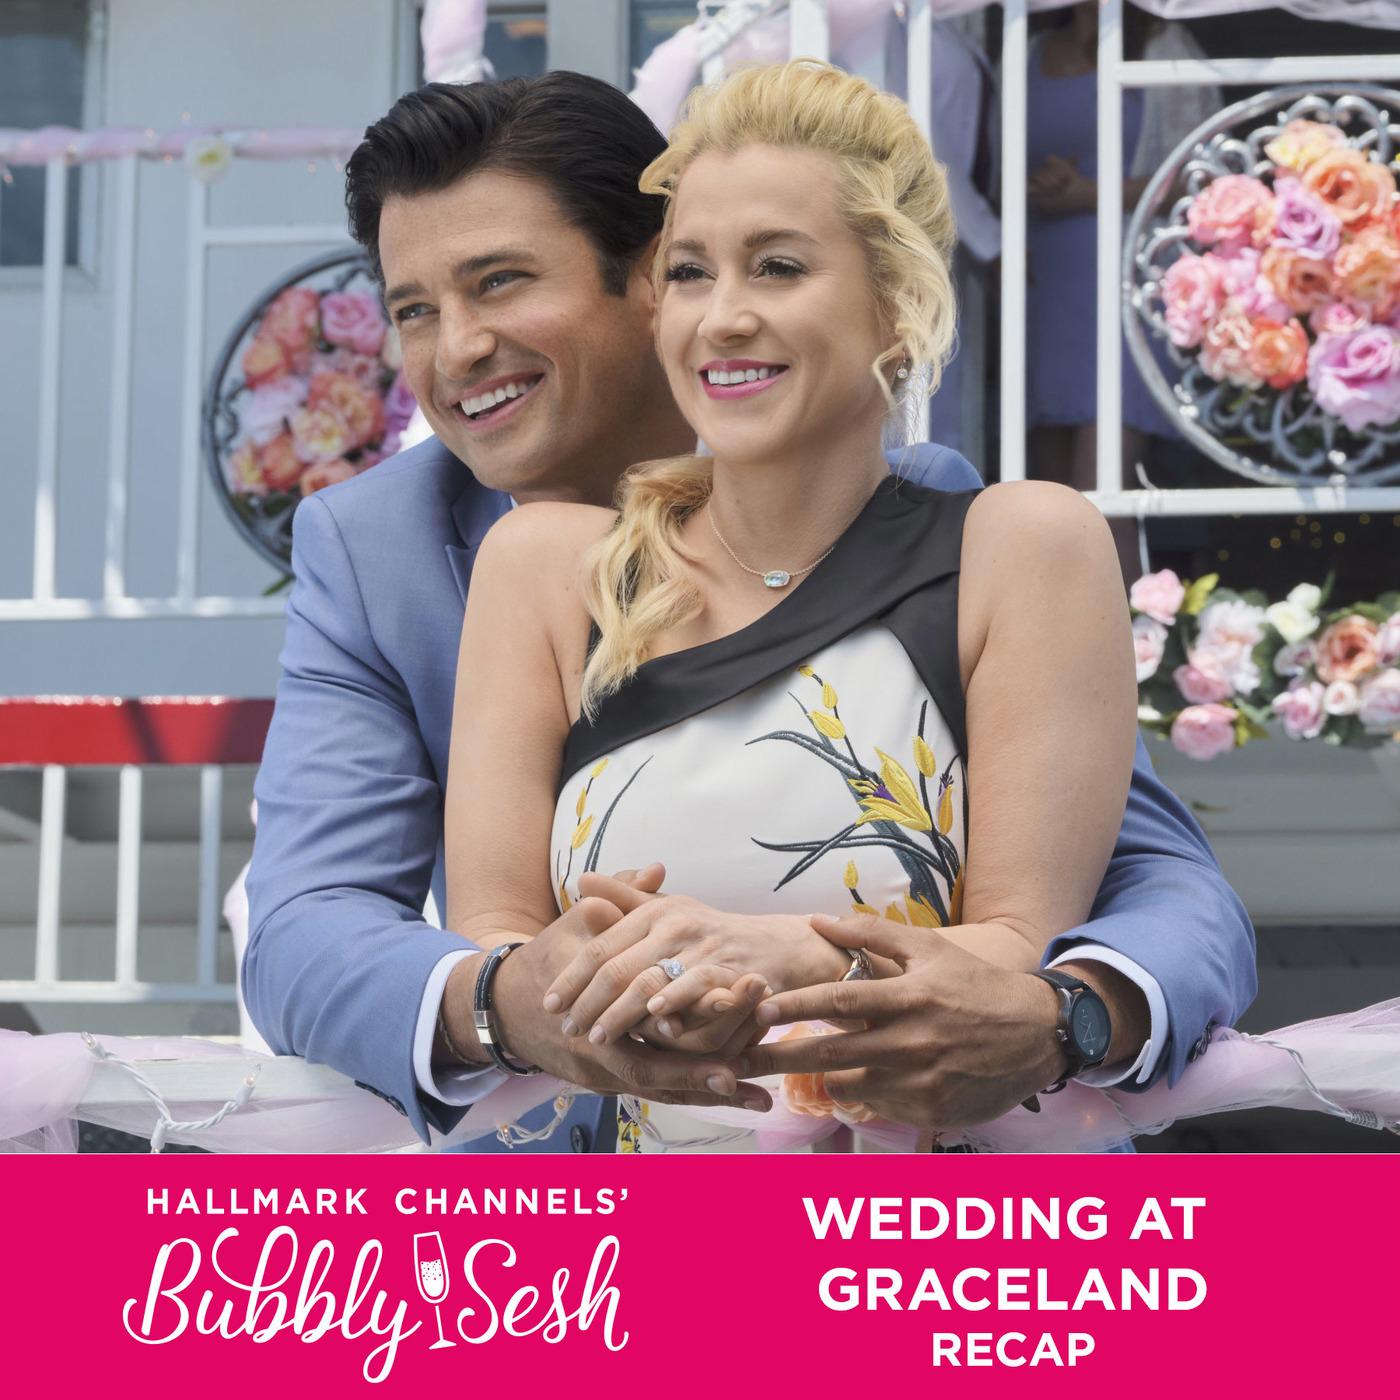 Wedding at Graceland - Recap